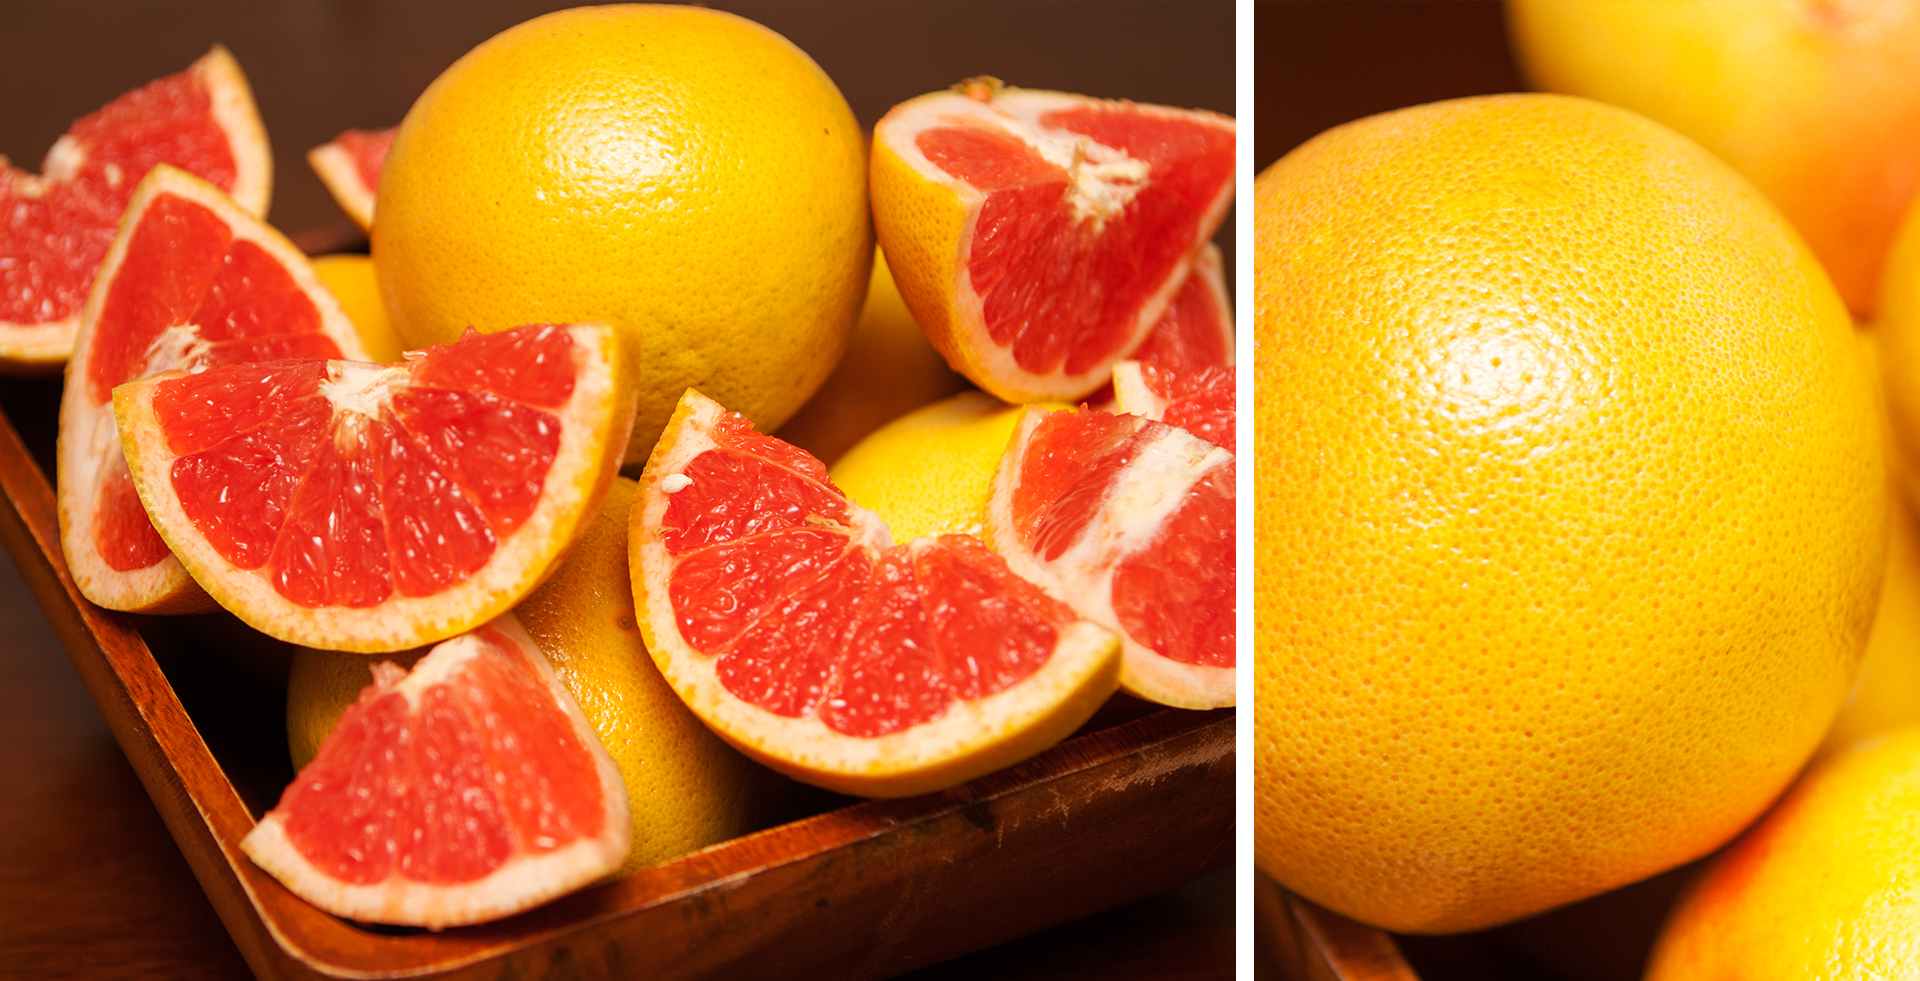 Oranges RCFDistributors